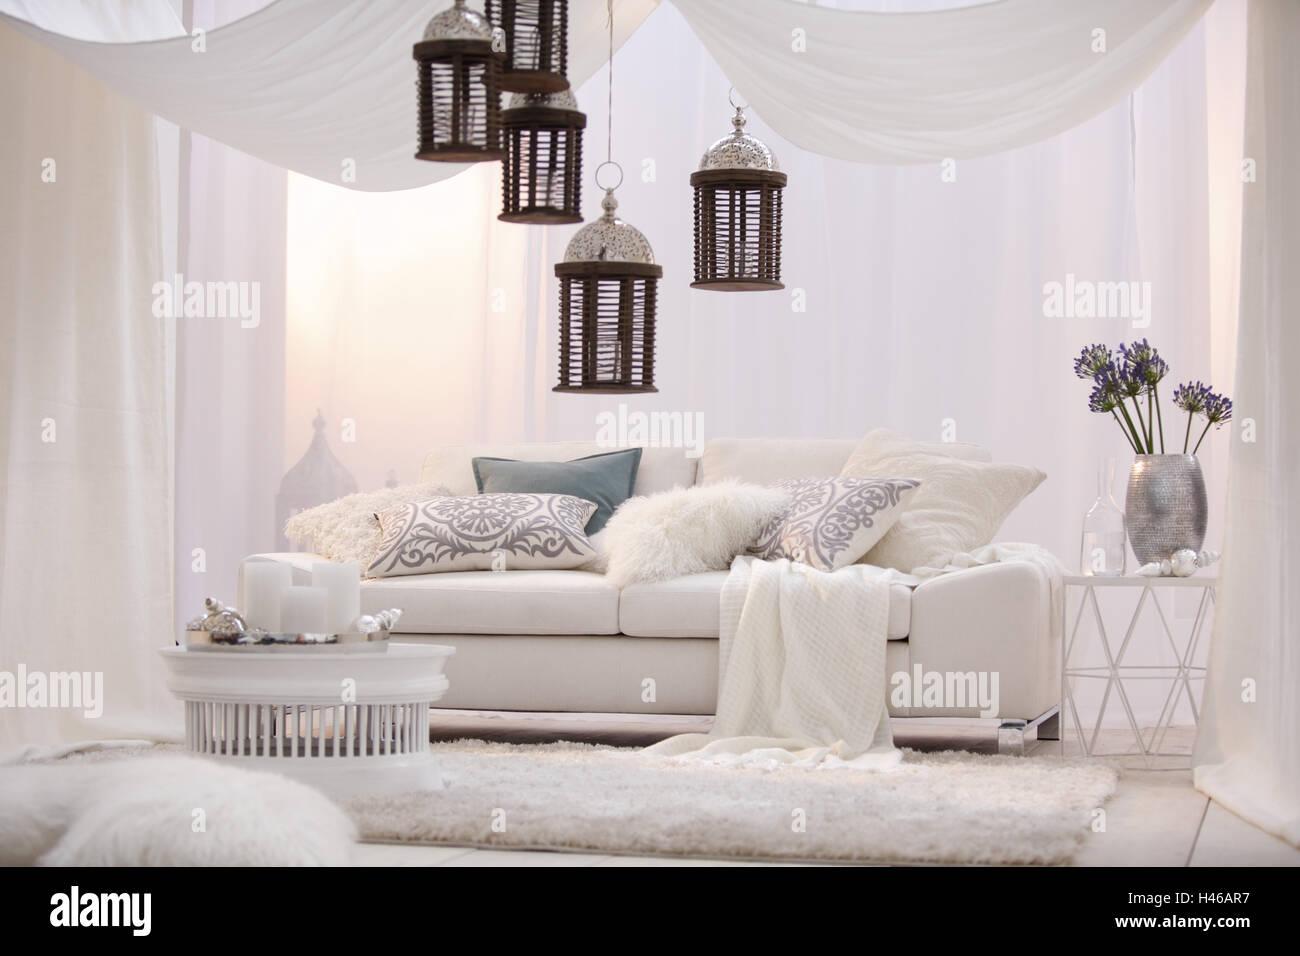 Couchtisch Kerzen Tablet Sofa Teppich Polster Laternen